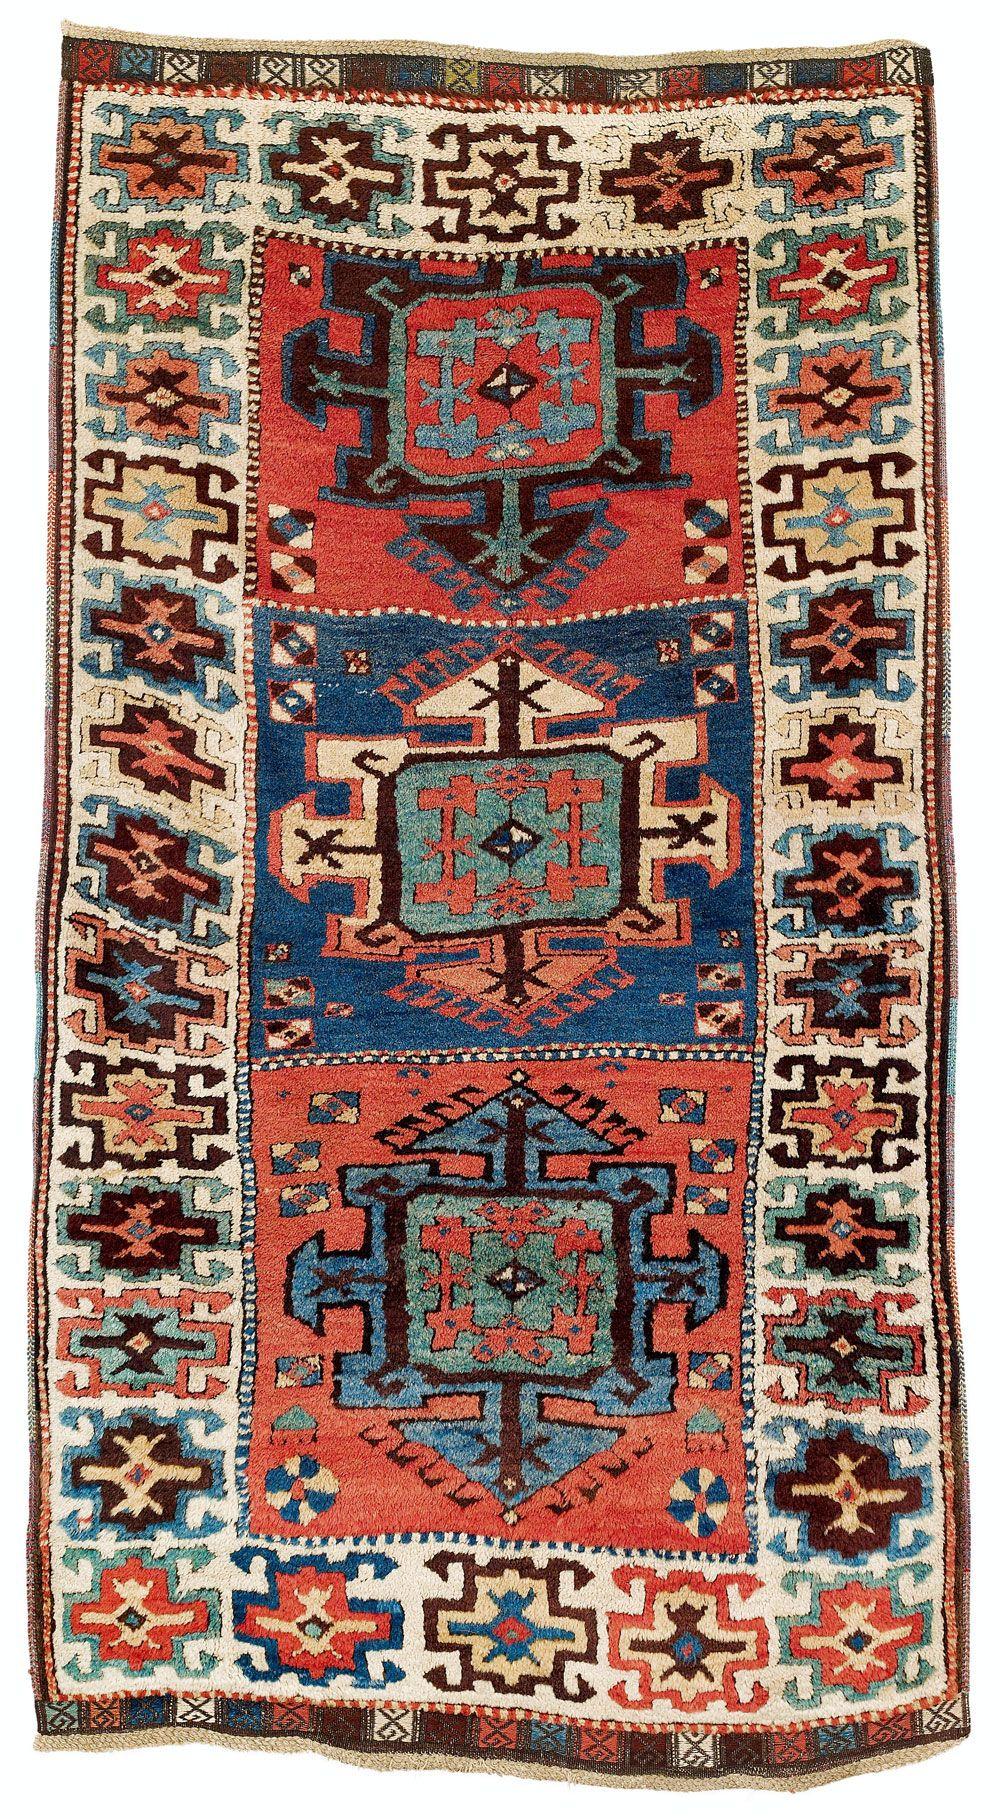 Polonaise antique oriental rugs - Kurdish Rug East Anatolia First Half 19th Century